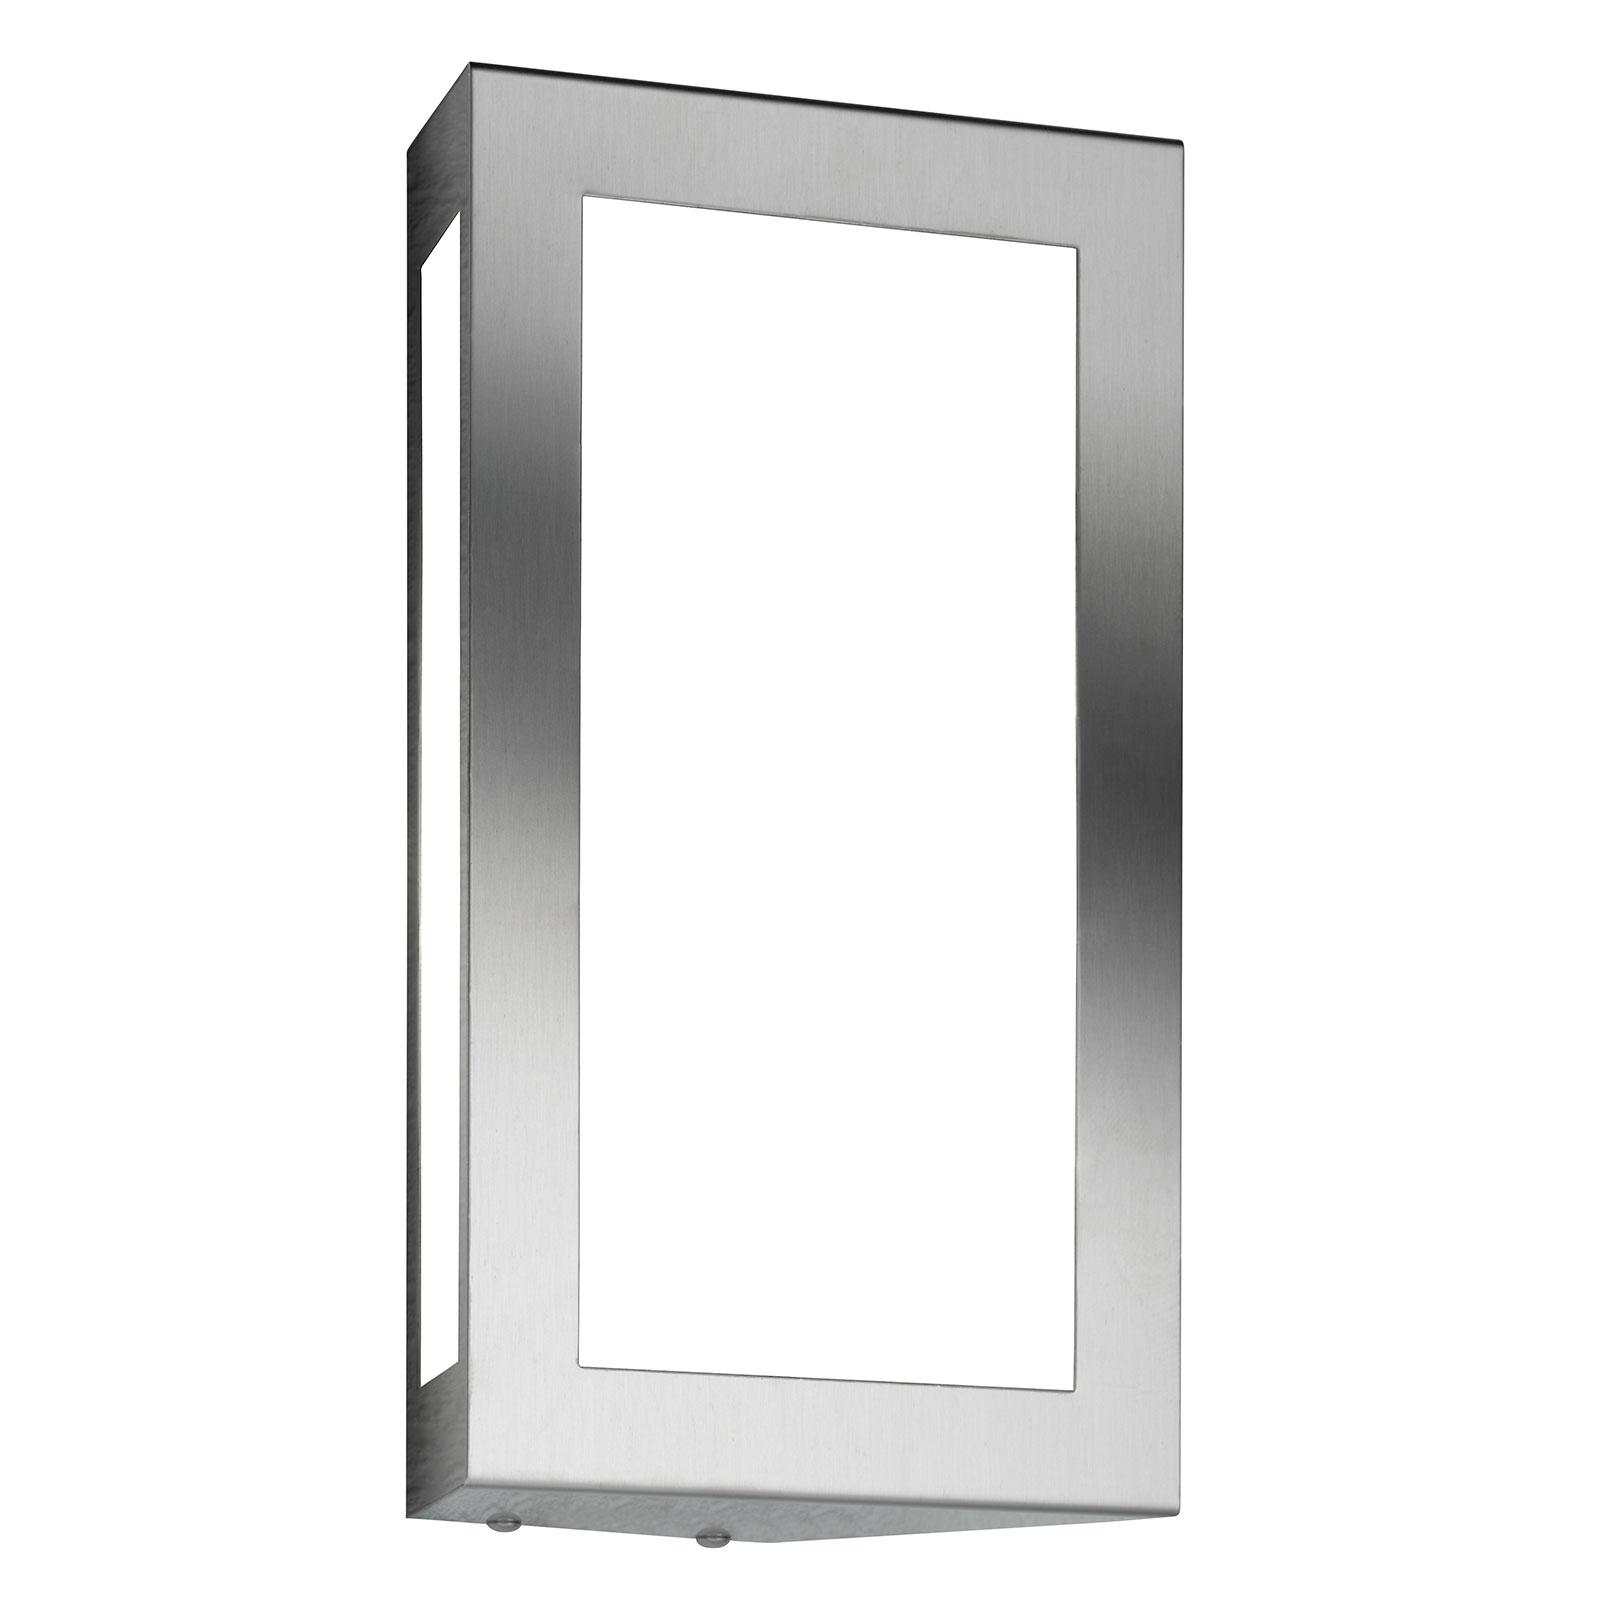 Vierkante buitenwandlamp Long, zonder sensor